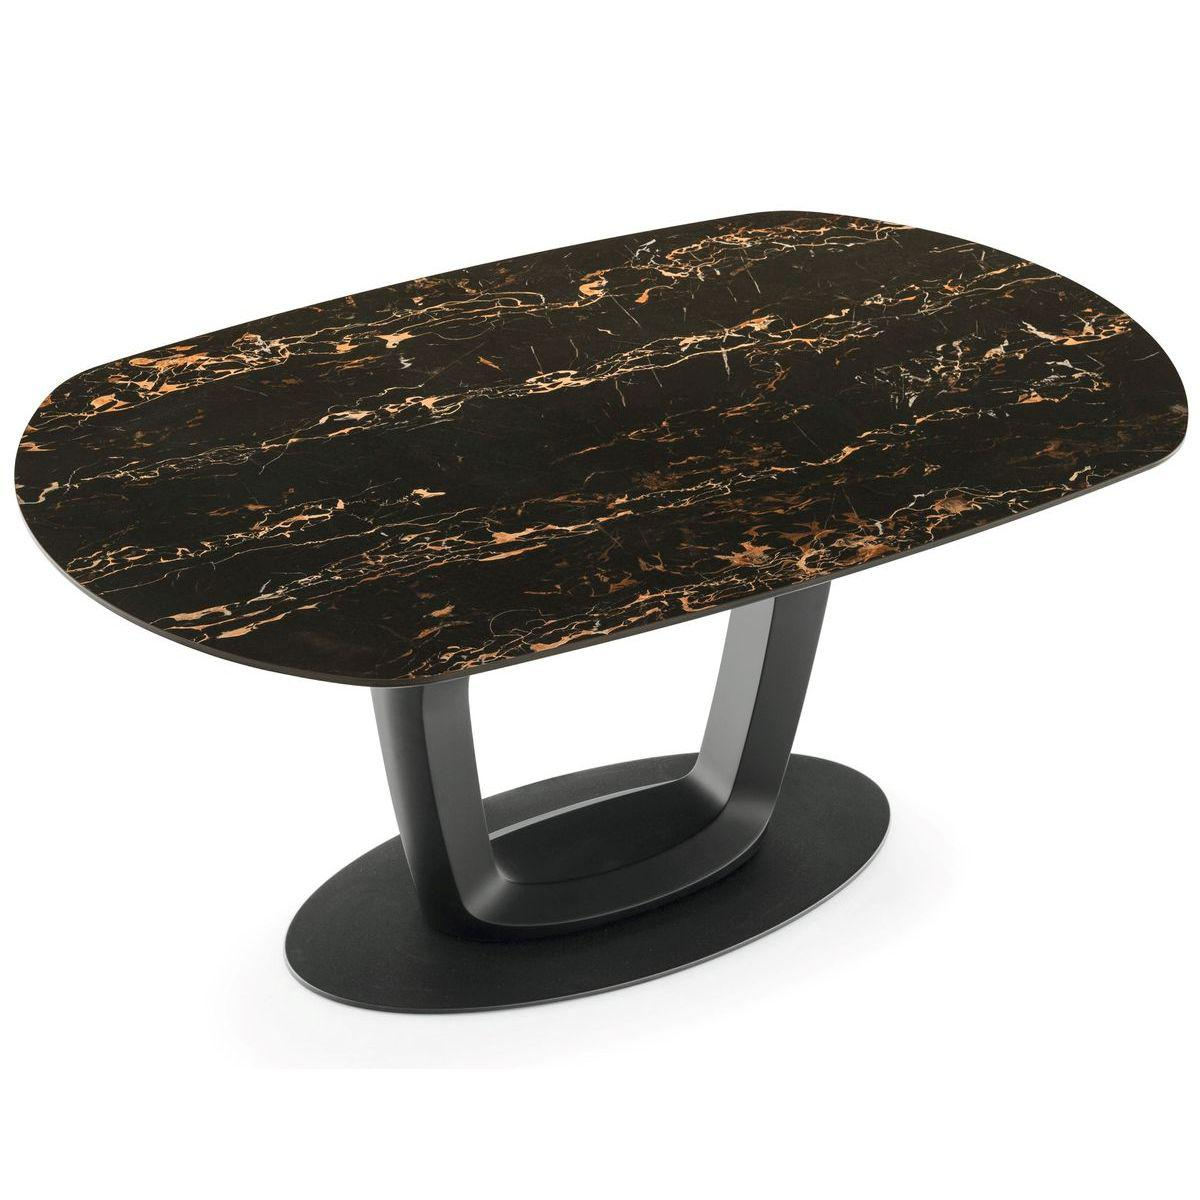 Table à rallonge ORBITAL Calligaris marbre noir